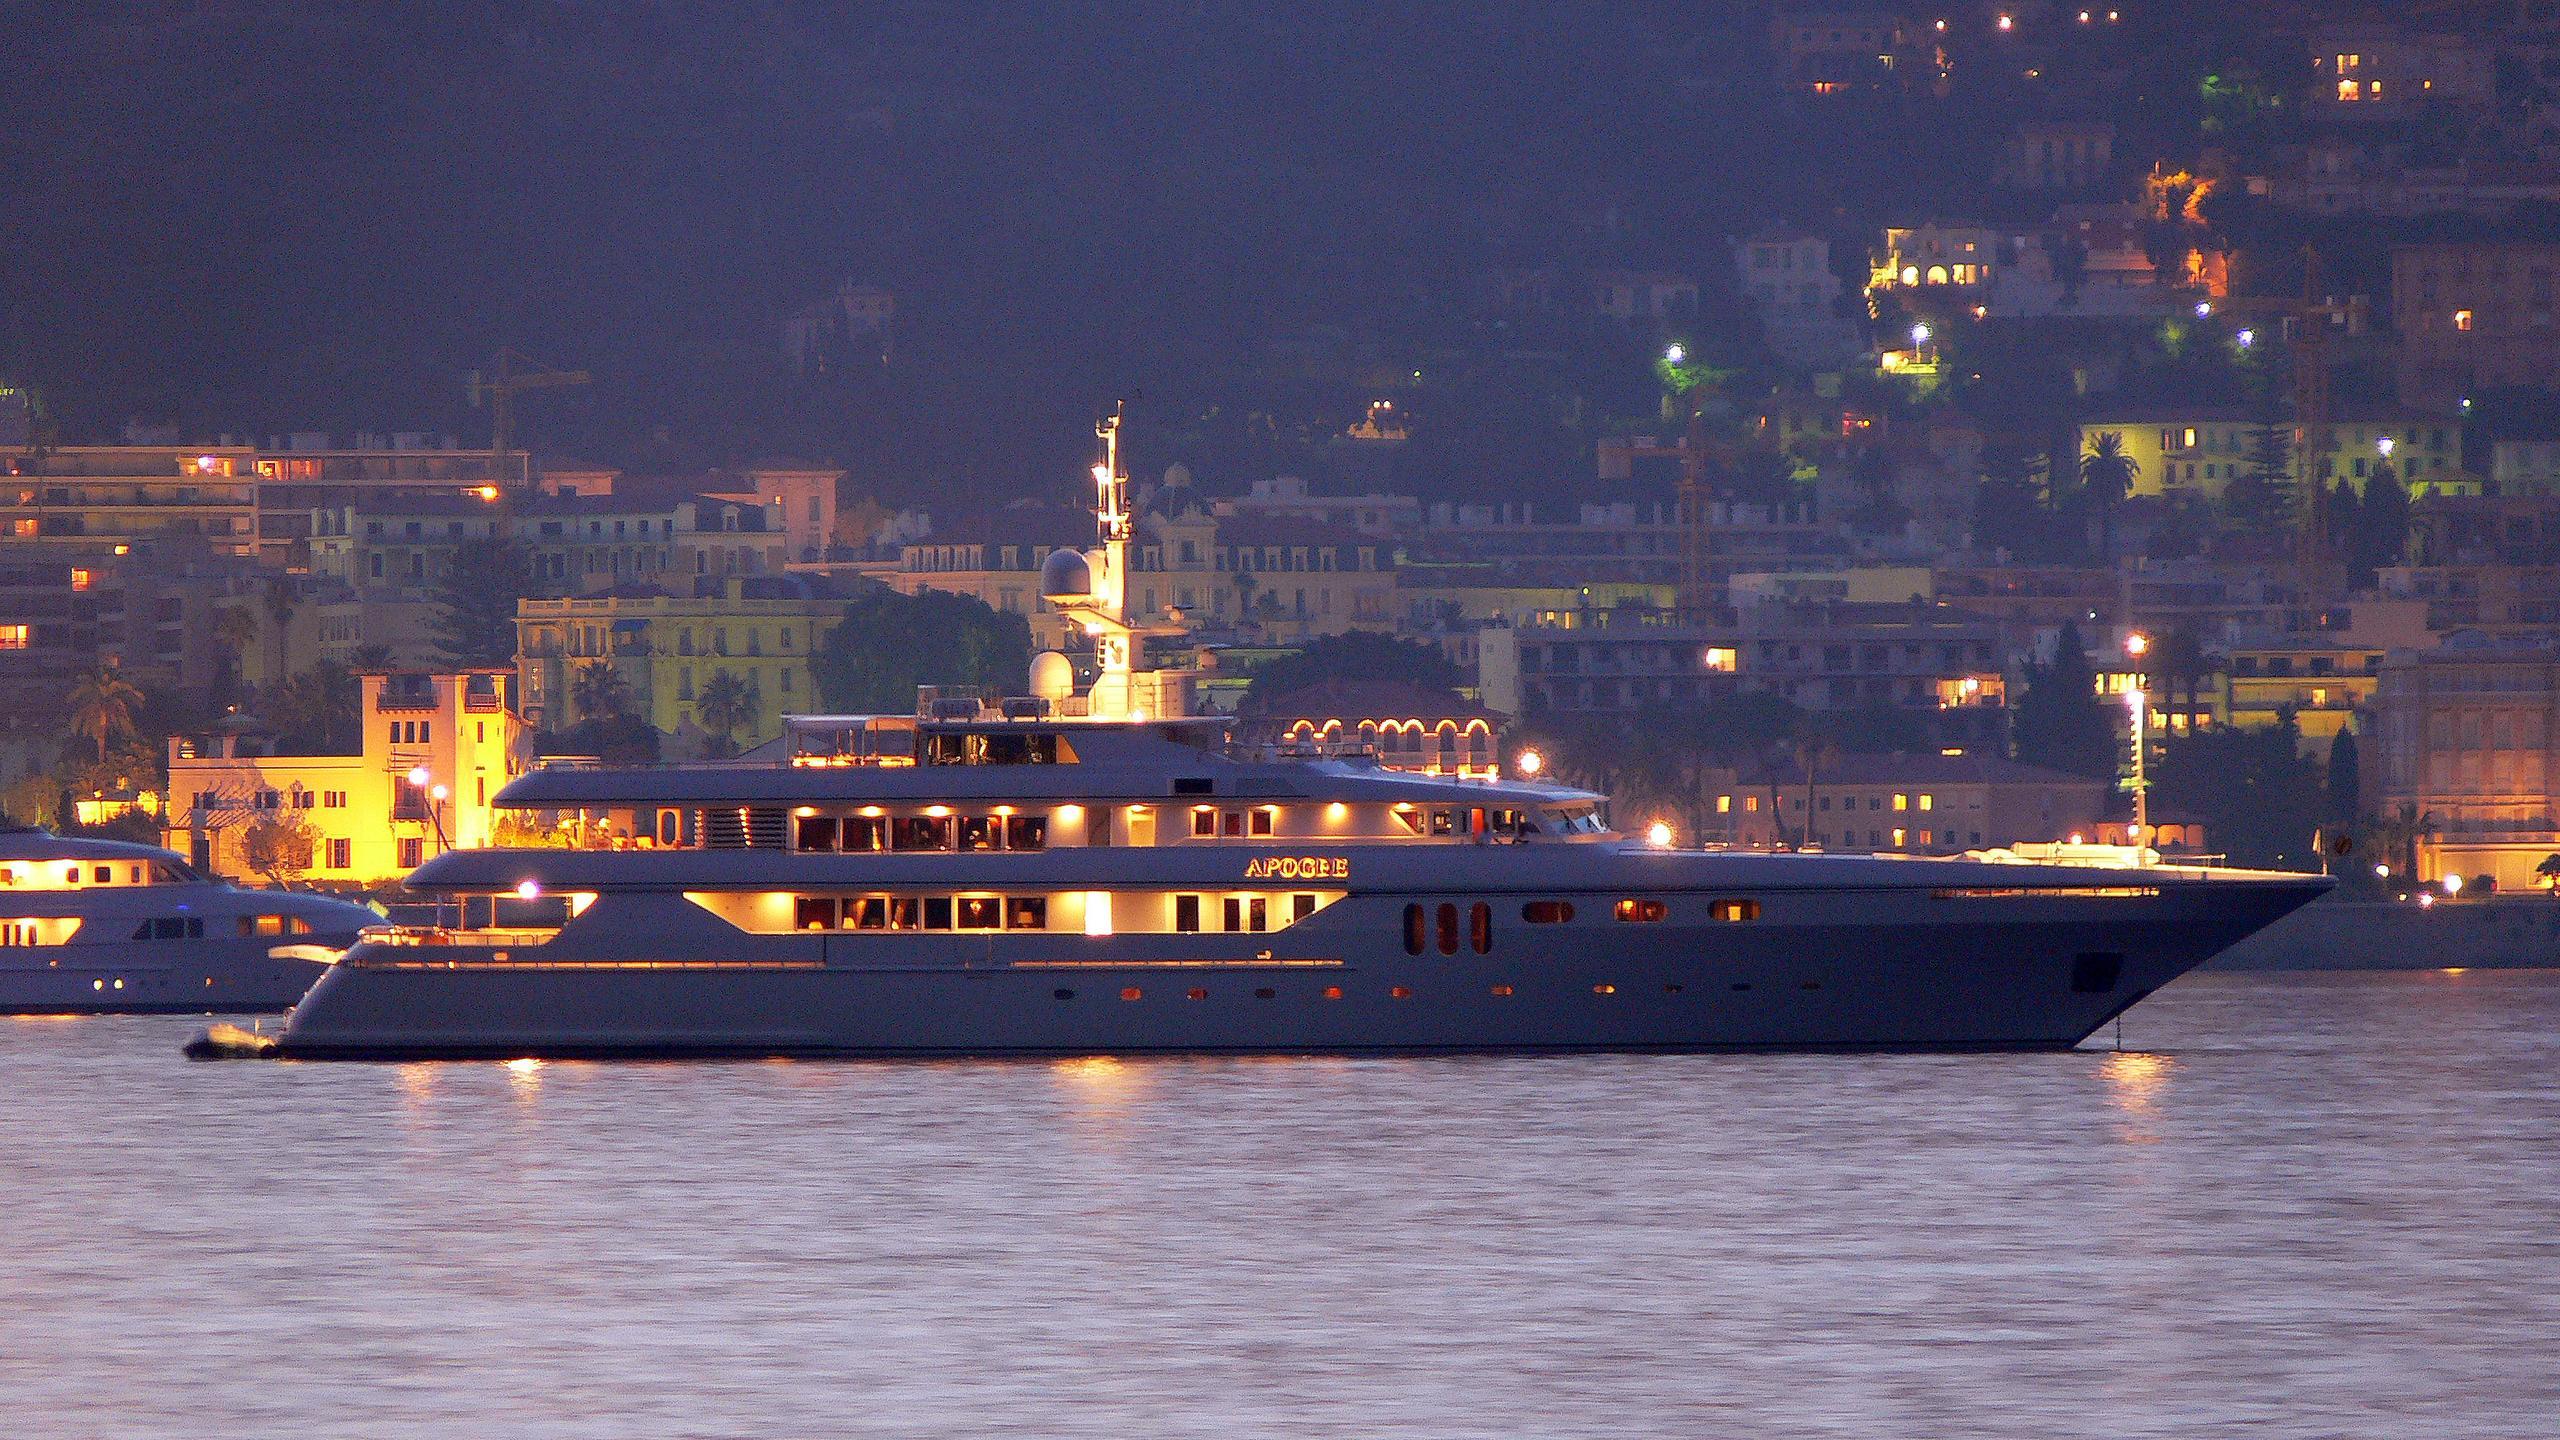 apogee-motor-yacht-codecasa-2003-62m-profile-by-night